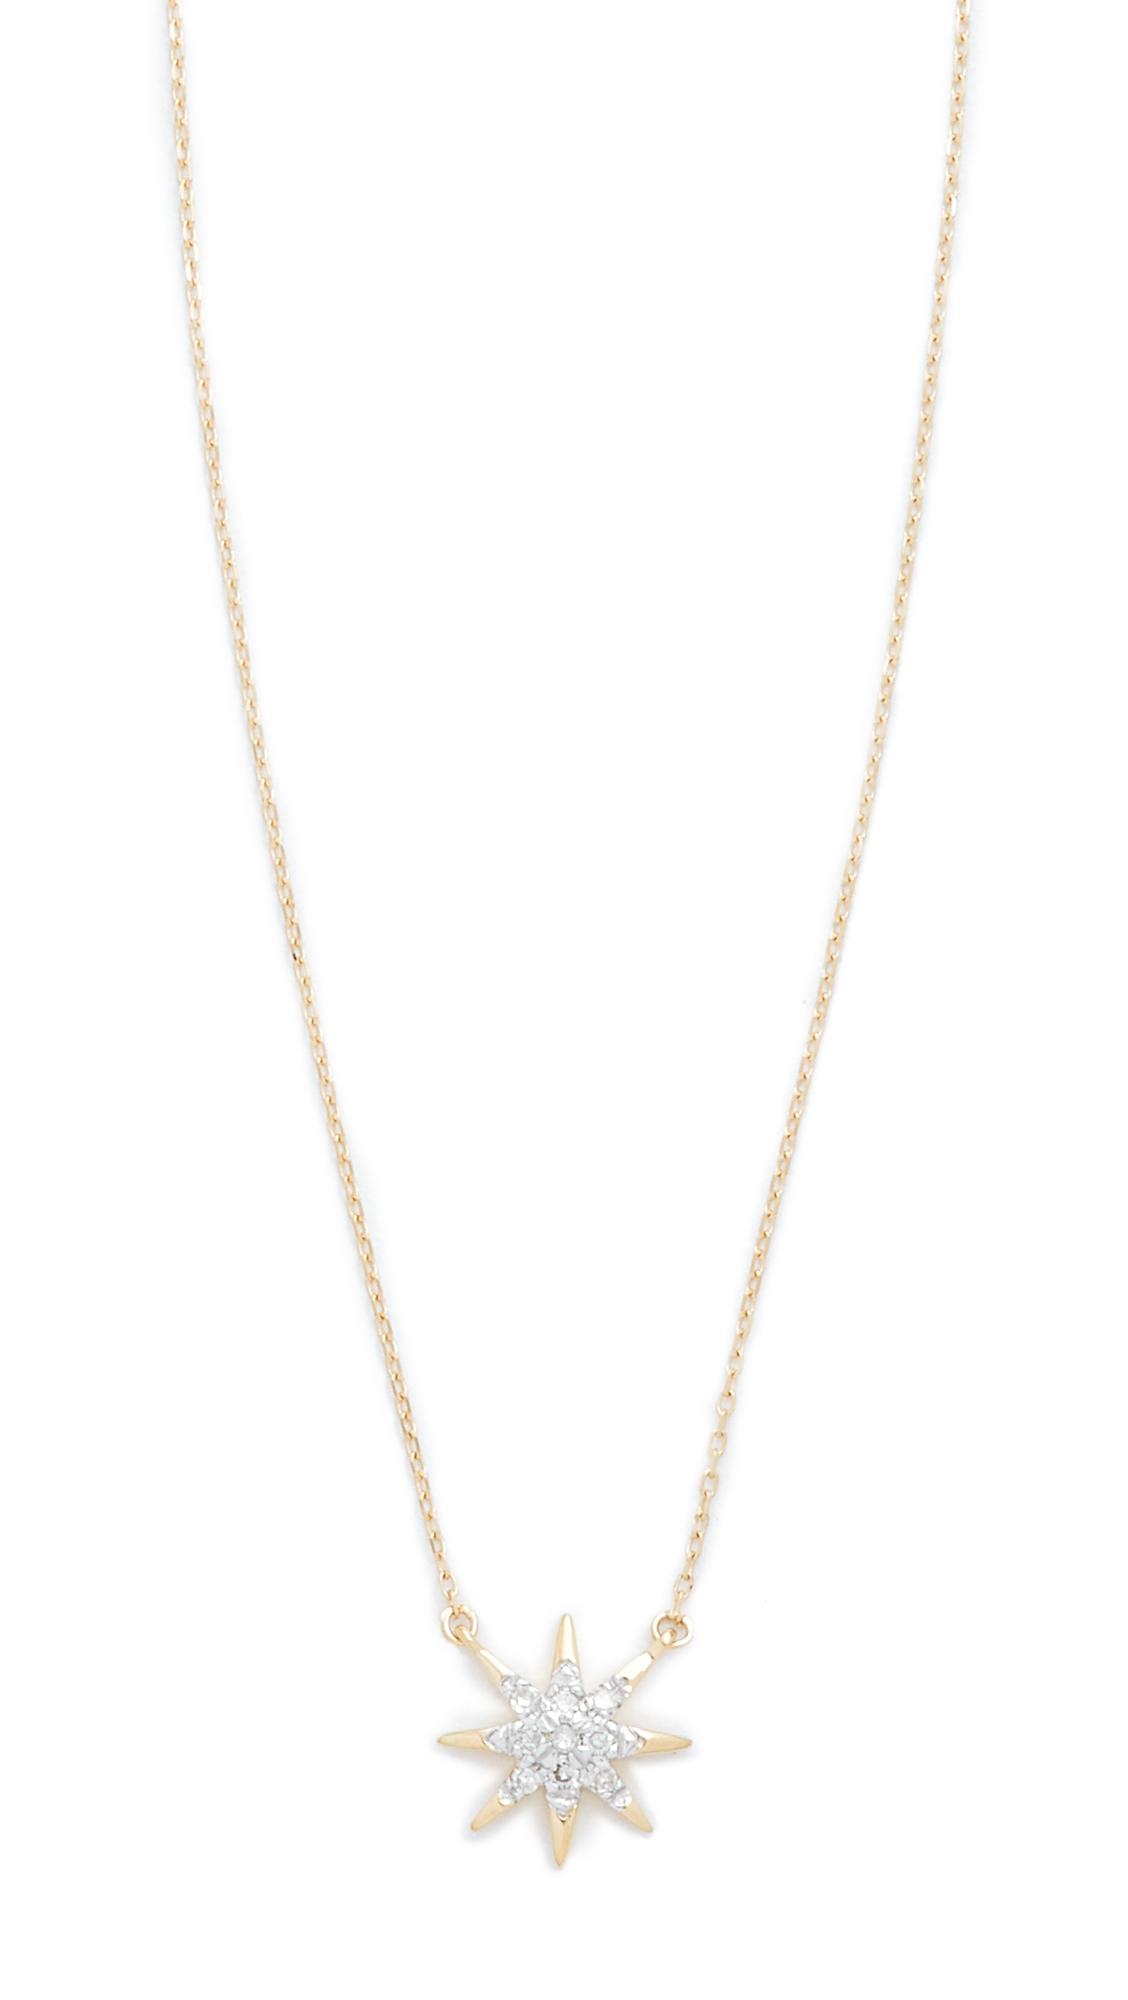 Adina Reyter Solid Pave Starburst Necklace - Gold